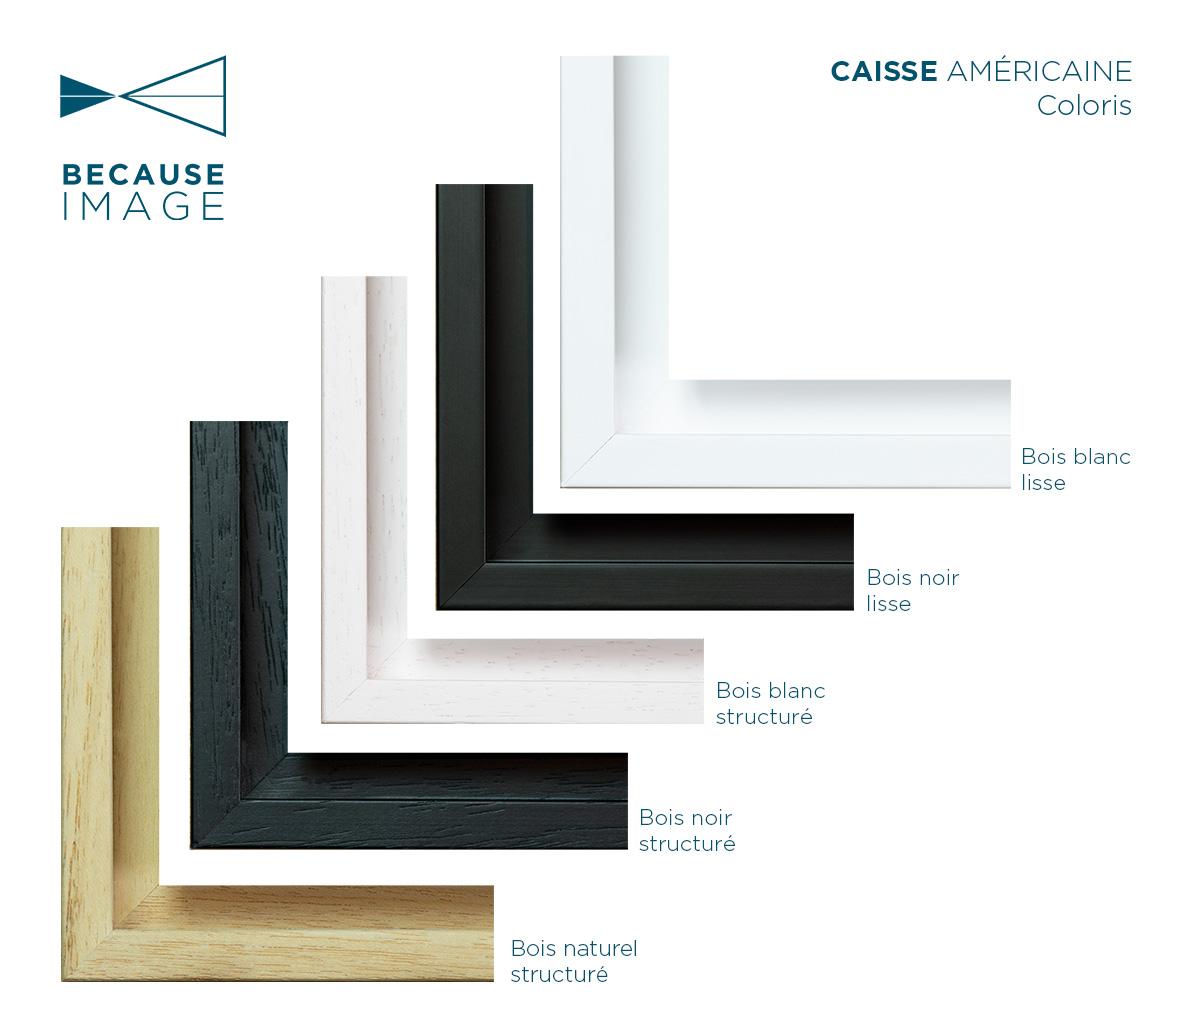 Coloris caisse américaine because image